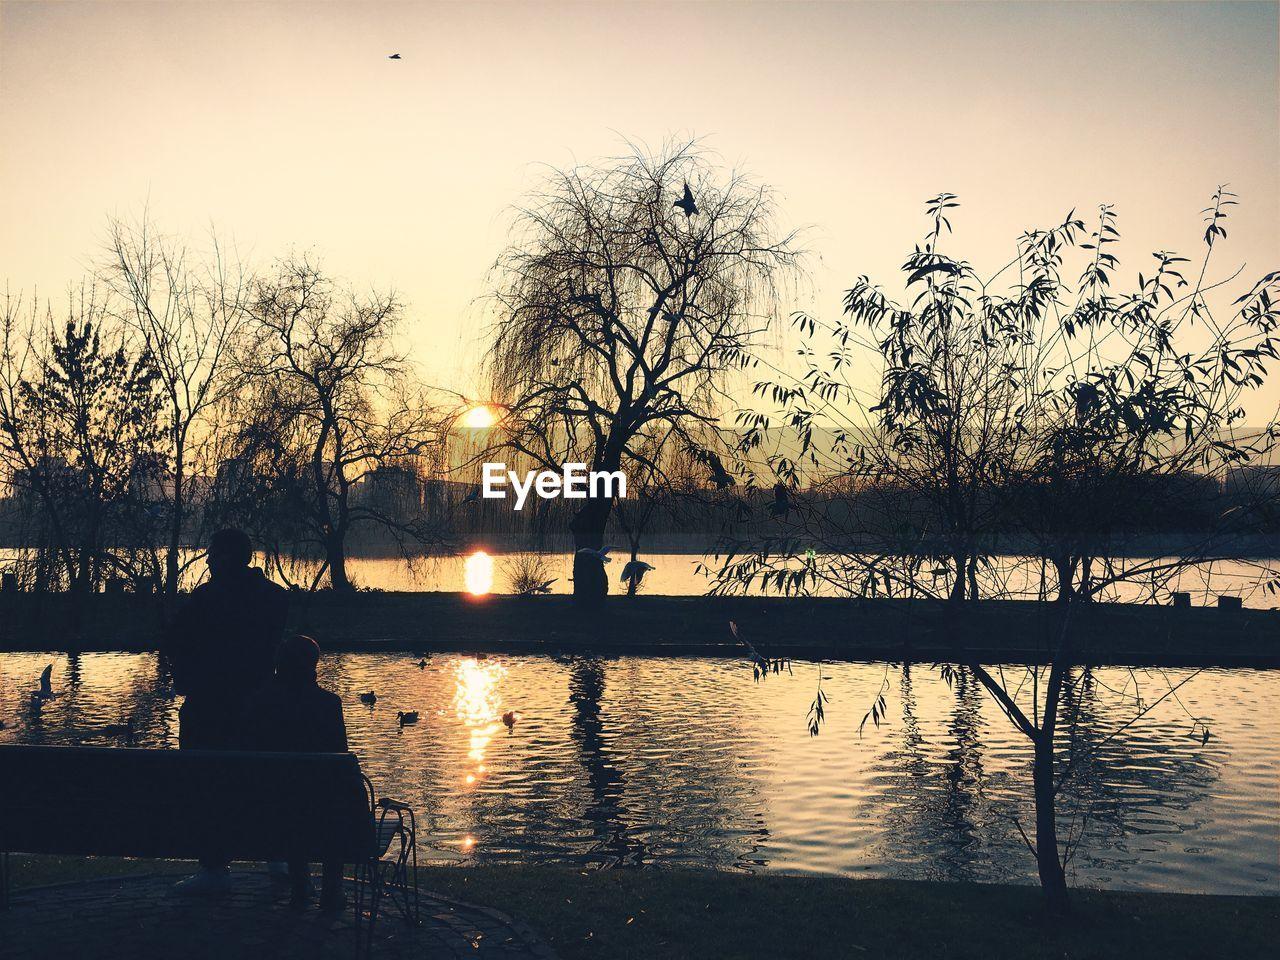 Silhouette of birds flying over lake